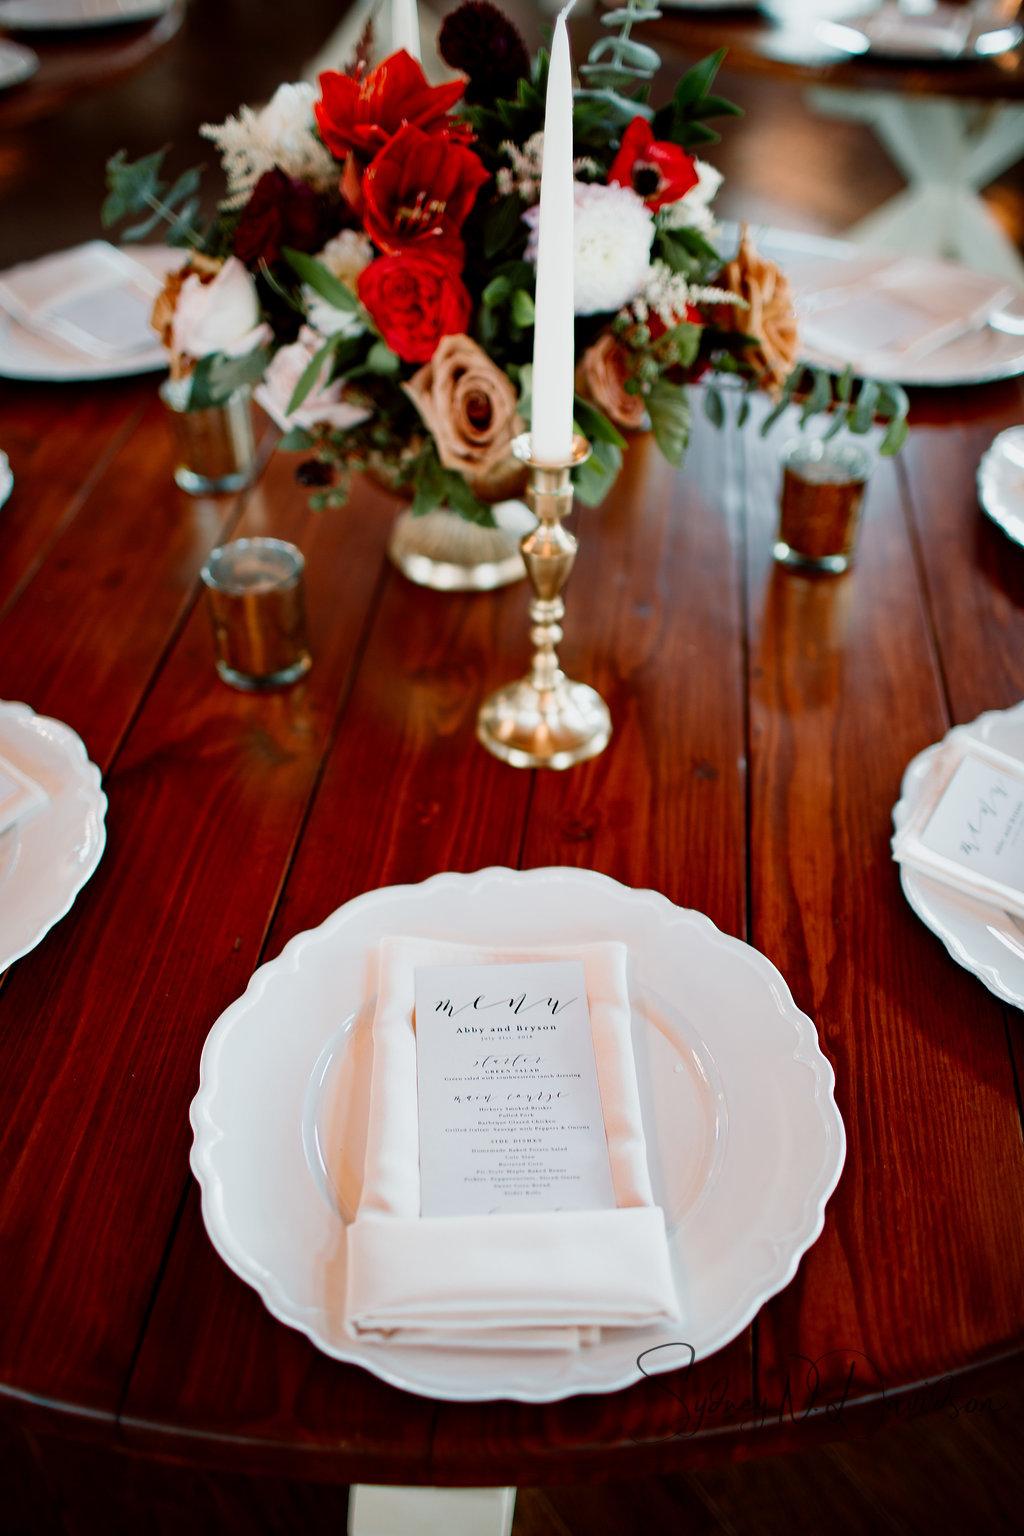 sydney-davidson-wedding-stillwater-oklahoma-wedding-session-traveling-photographer-portrait-tulsa-oklahoma-6336.jpg